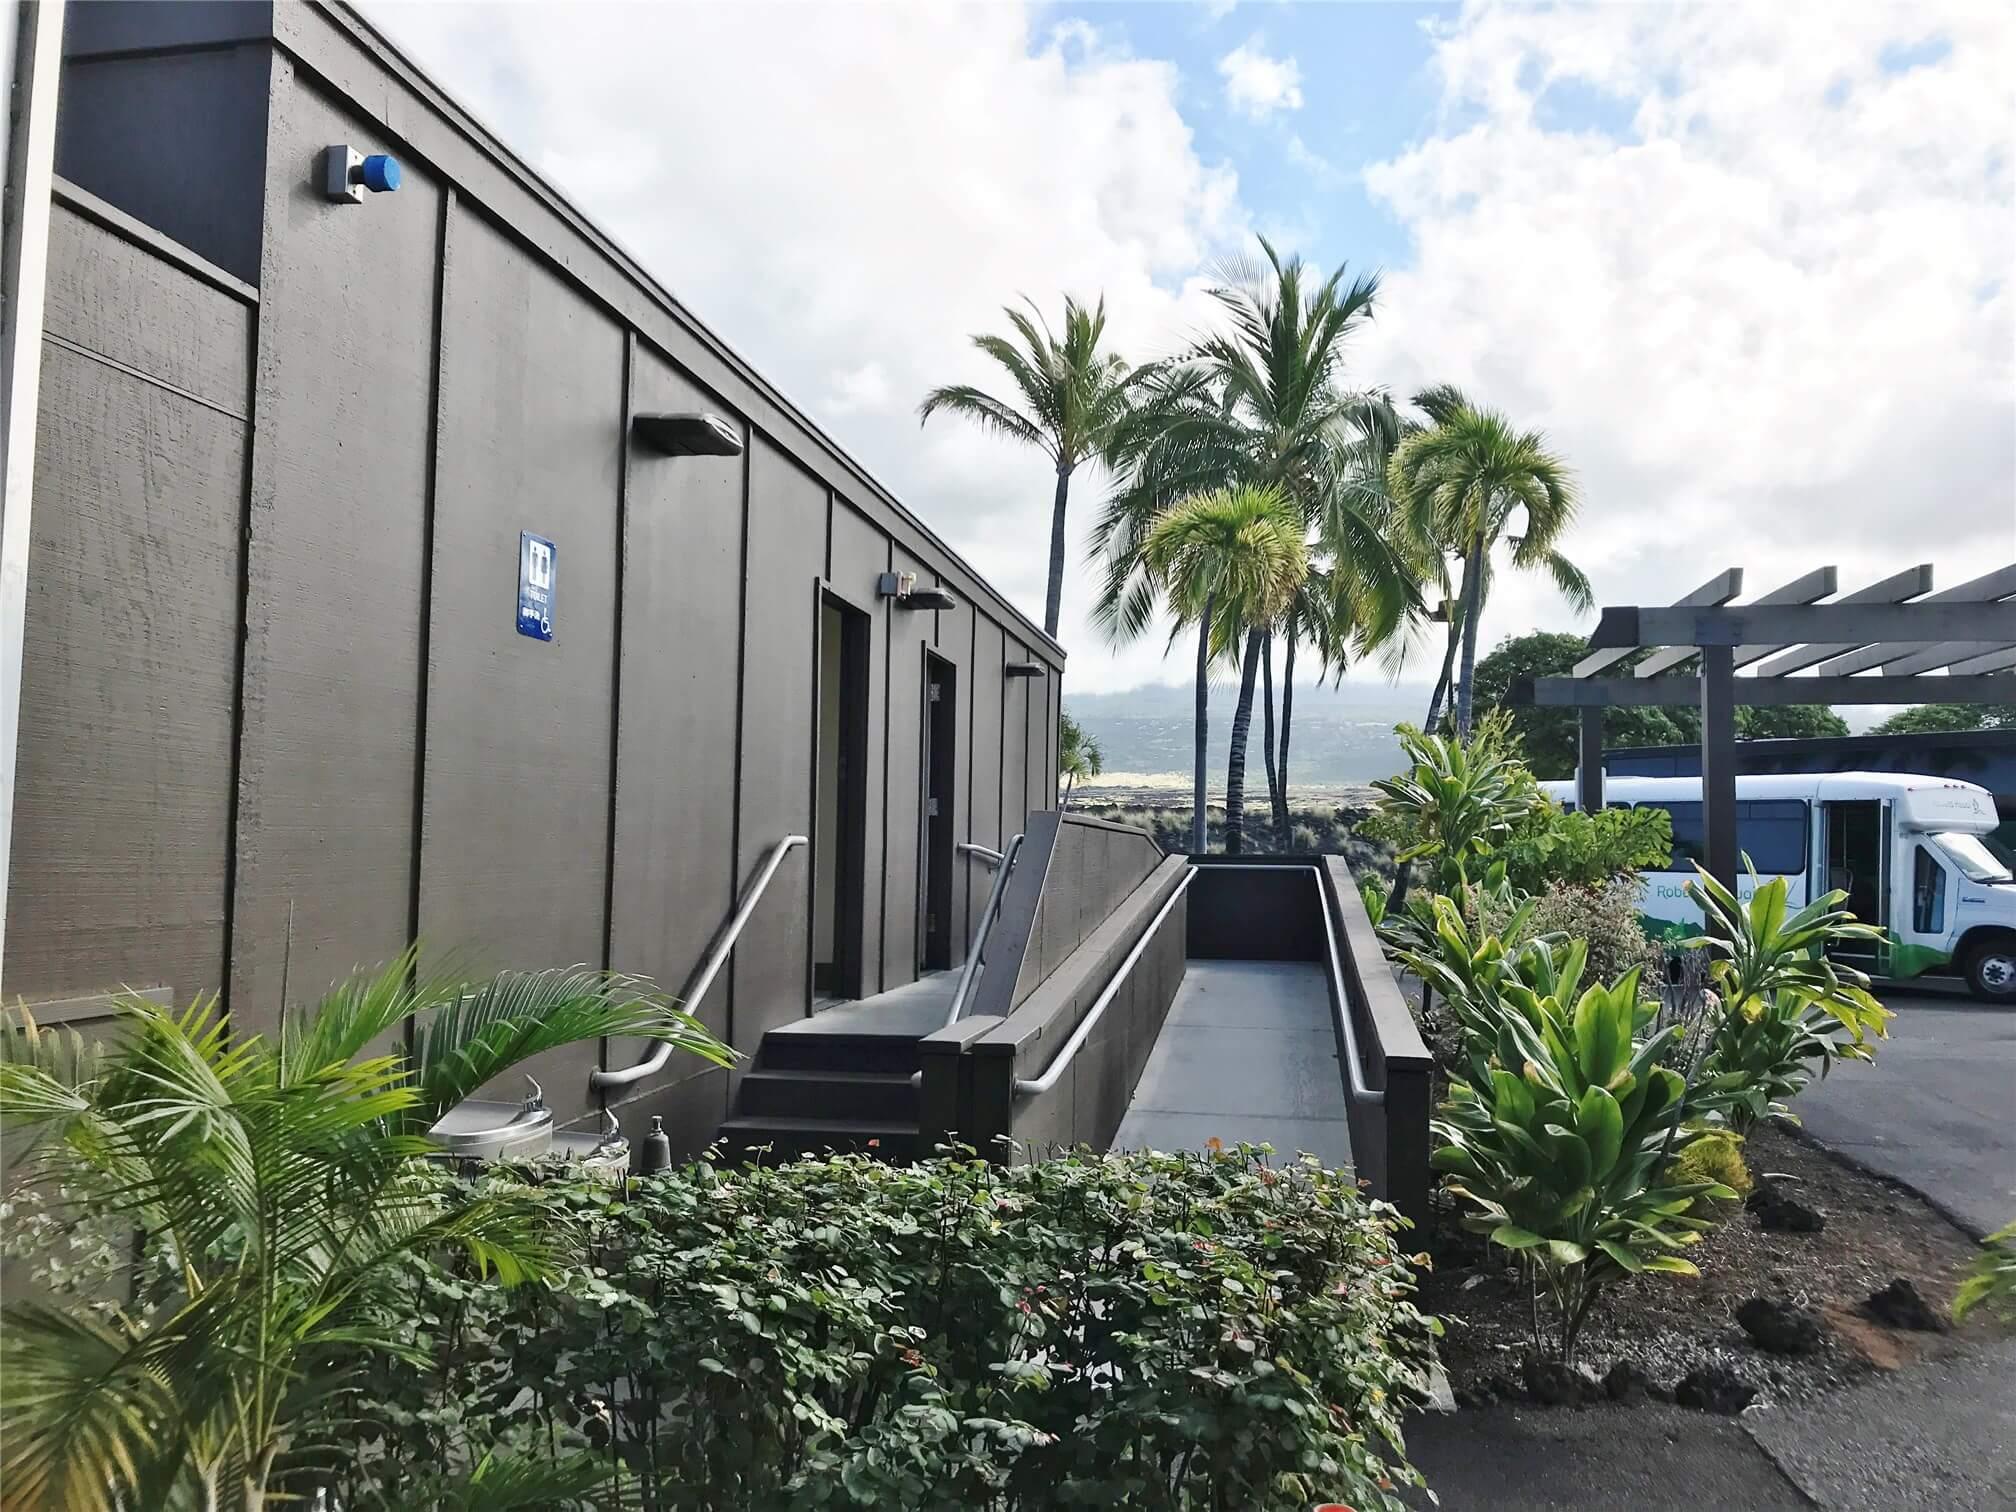 kona airport arrival terminal restroom